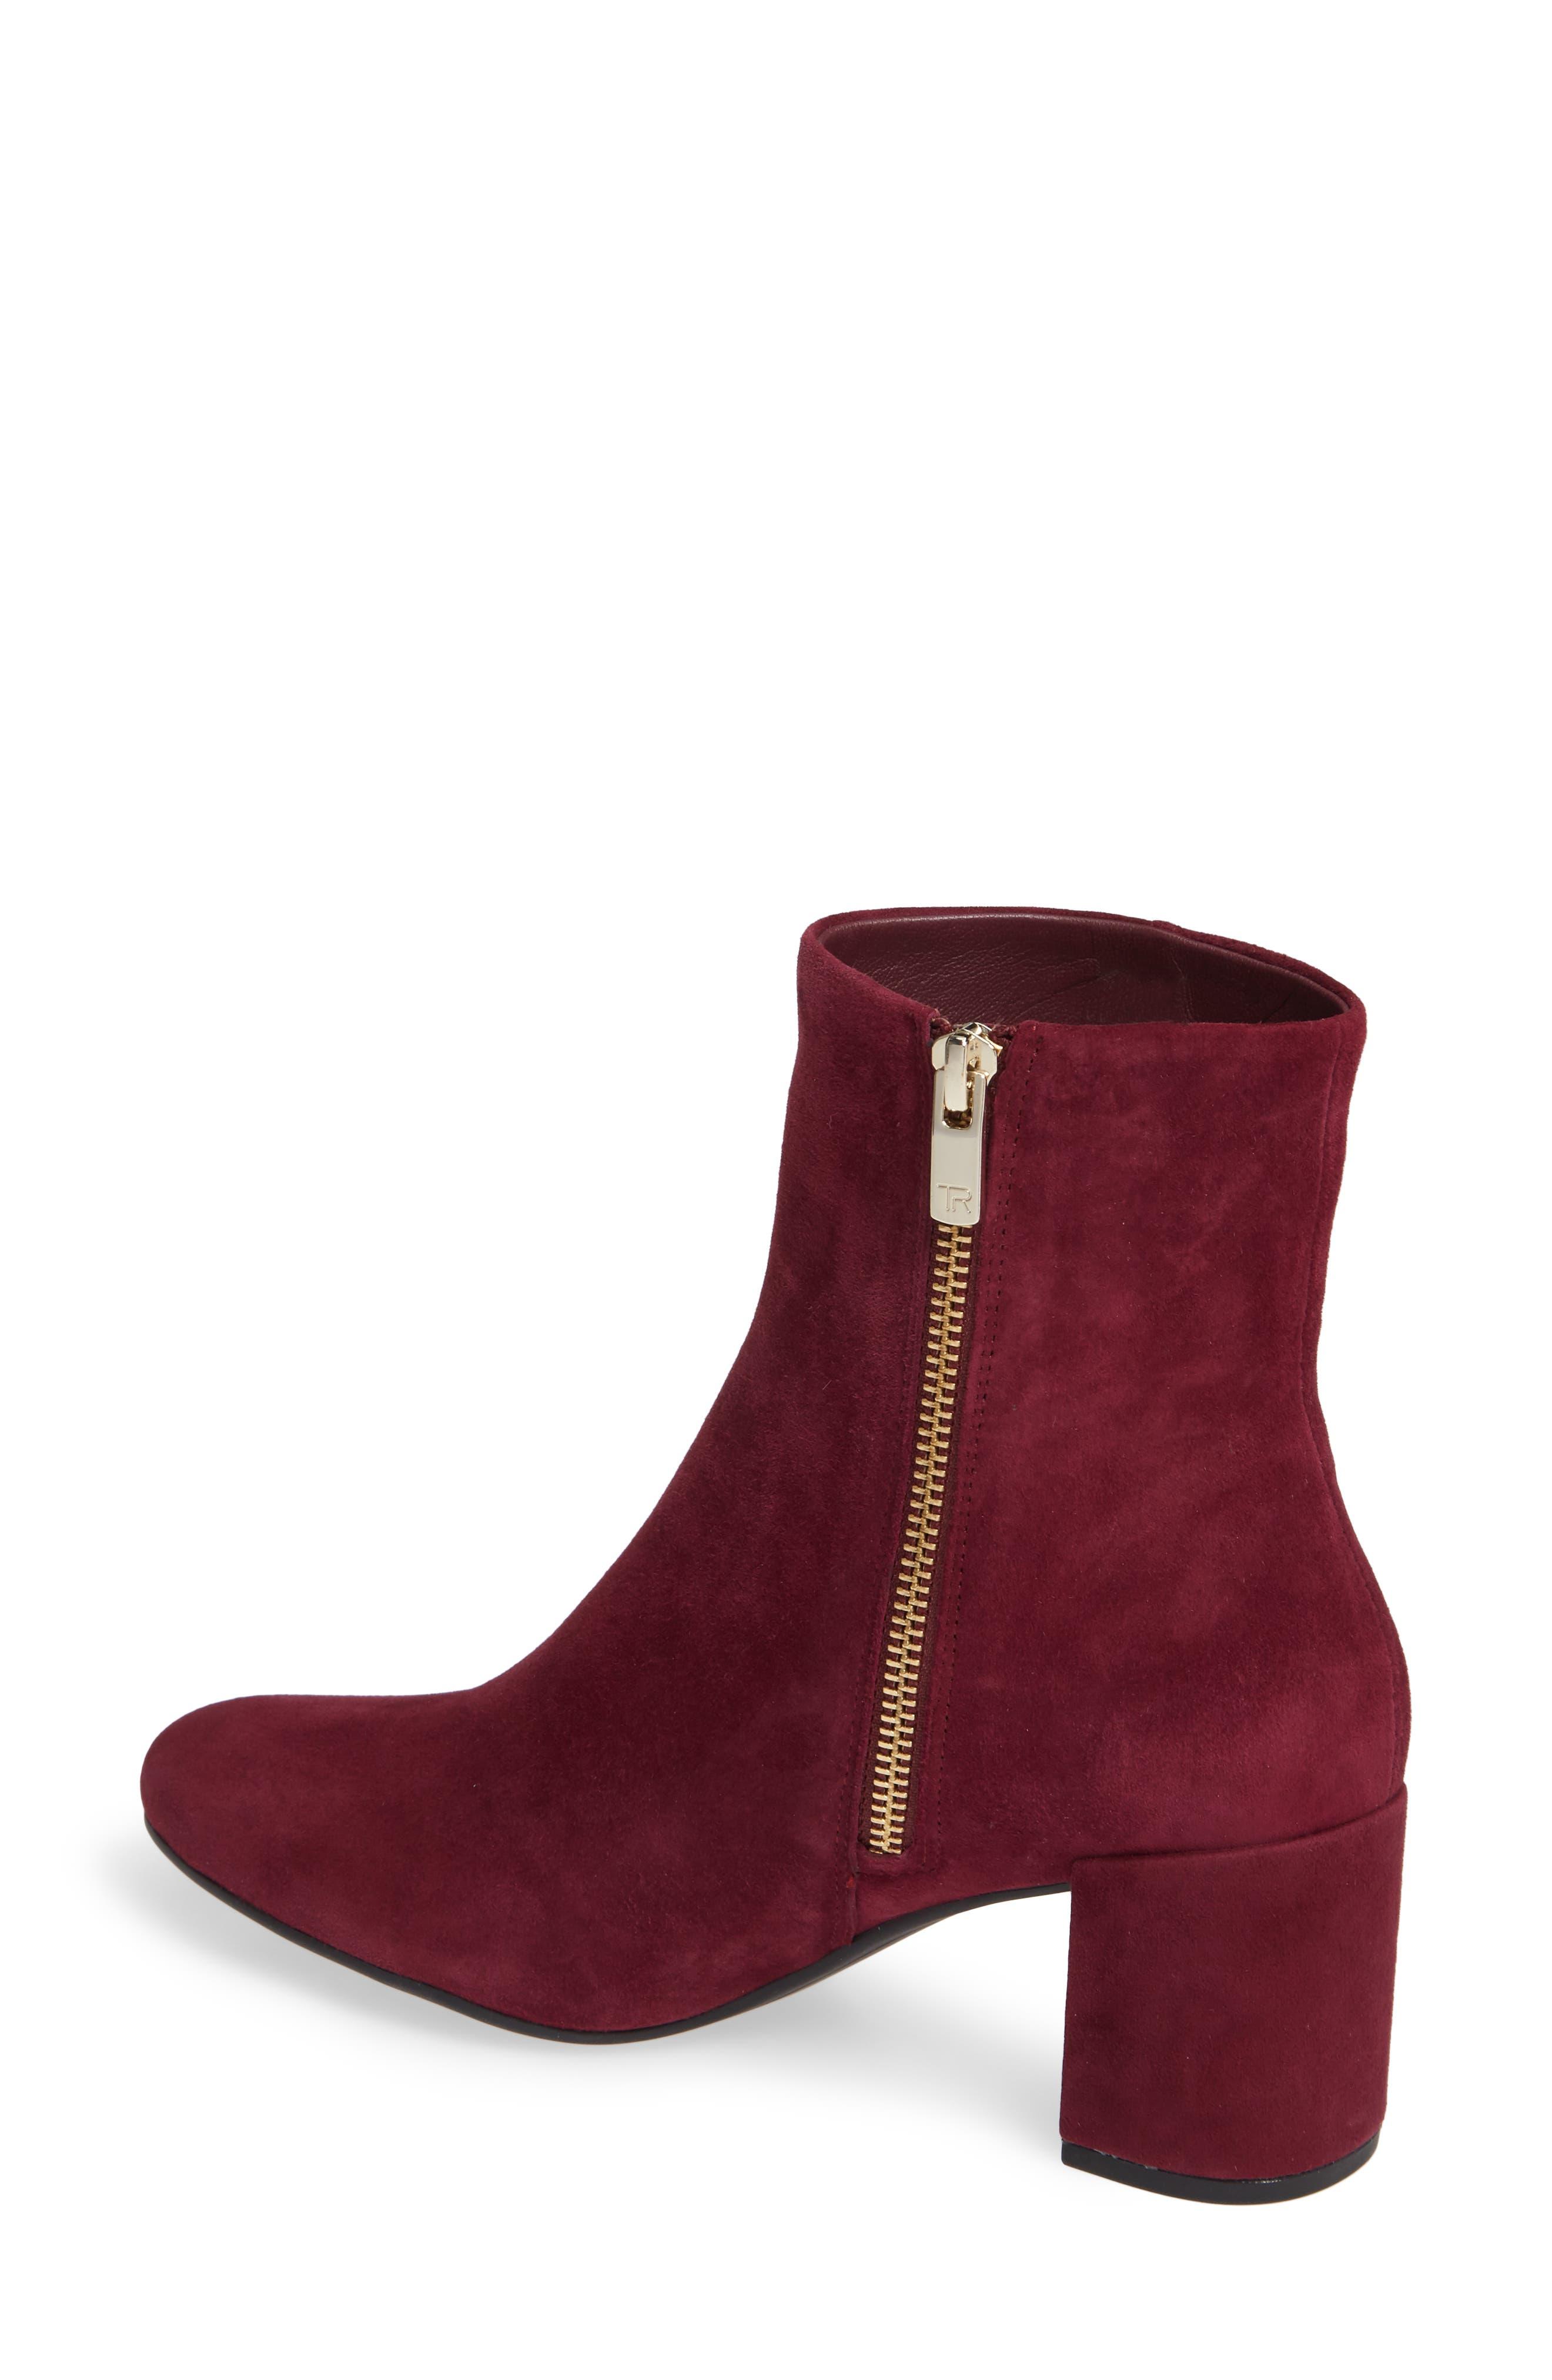 7b72deb09d14 Women s Taryn Rose Booties   Ankle Boots